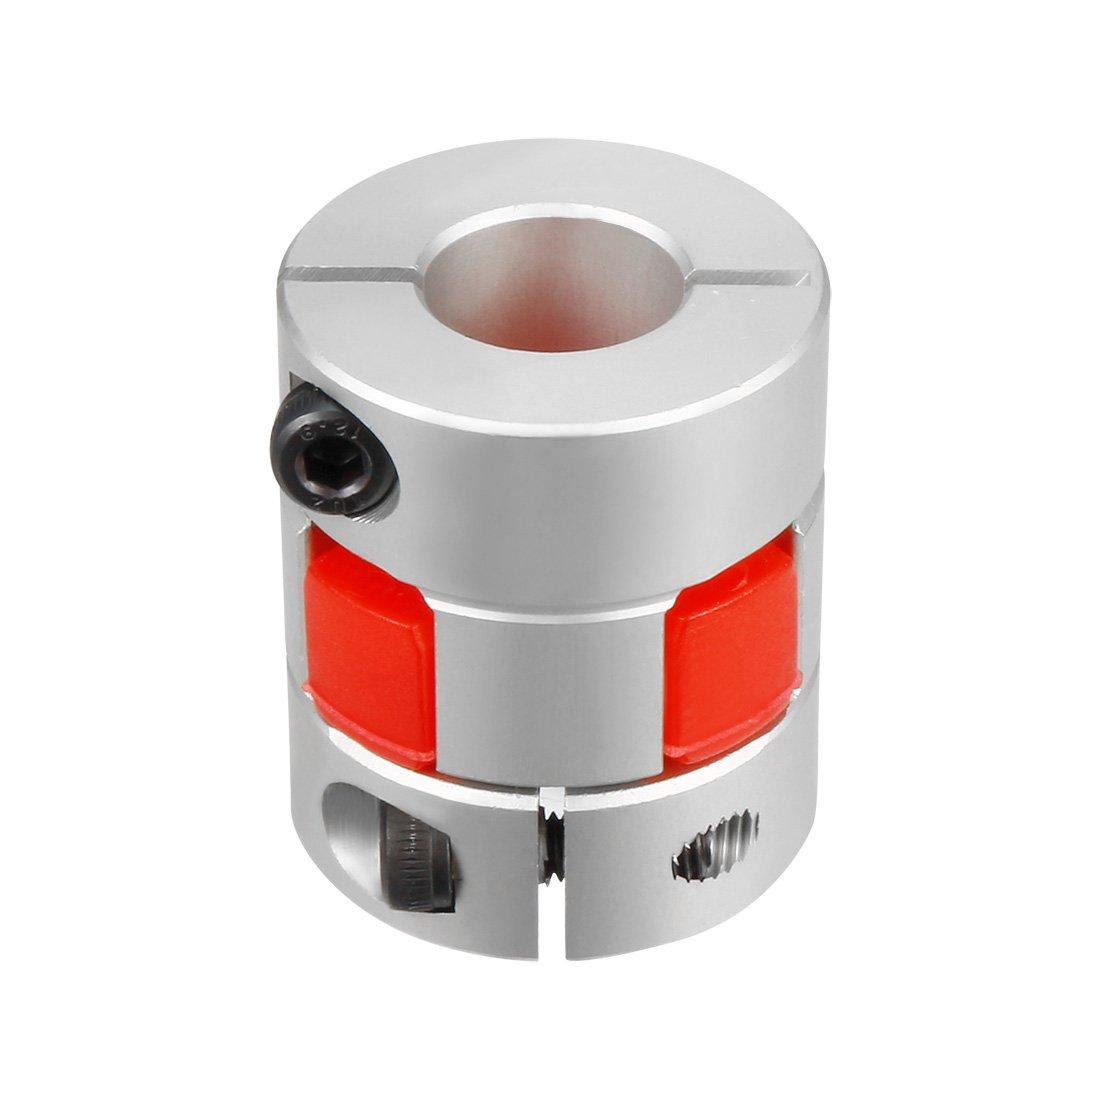 14mm to 19mm Shaft Plum Shaped Coupling Coupler 40mm Diameter 55mm Length